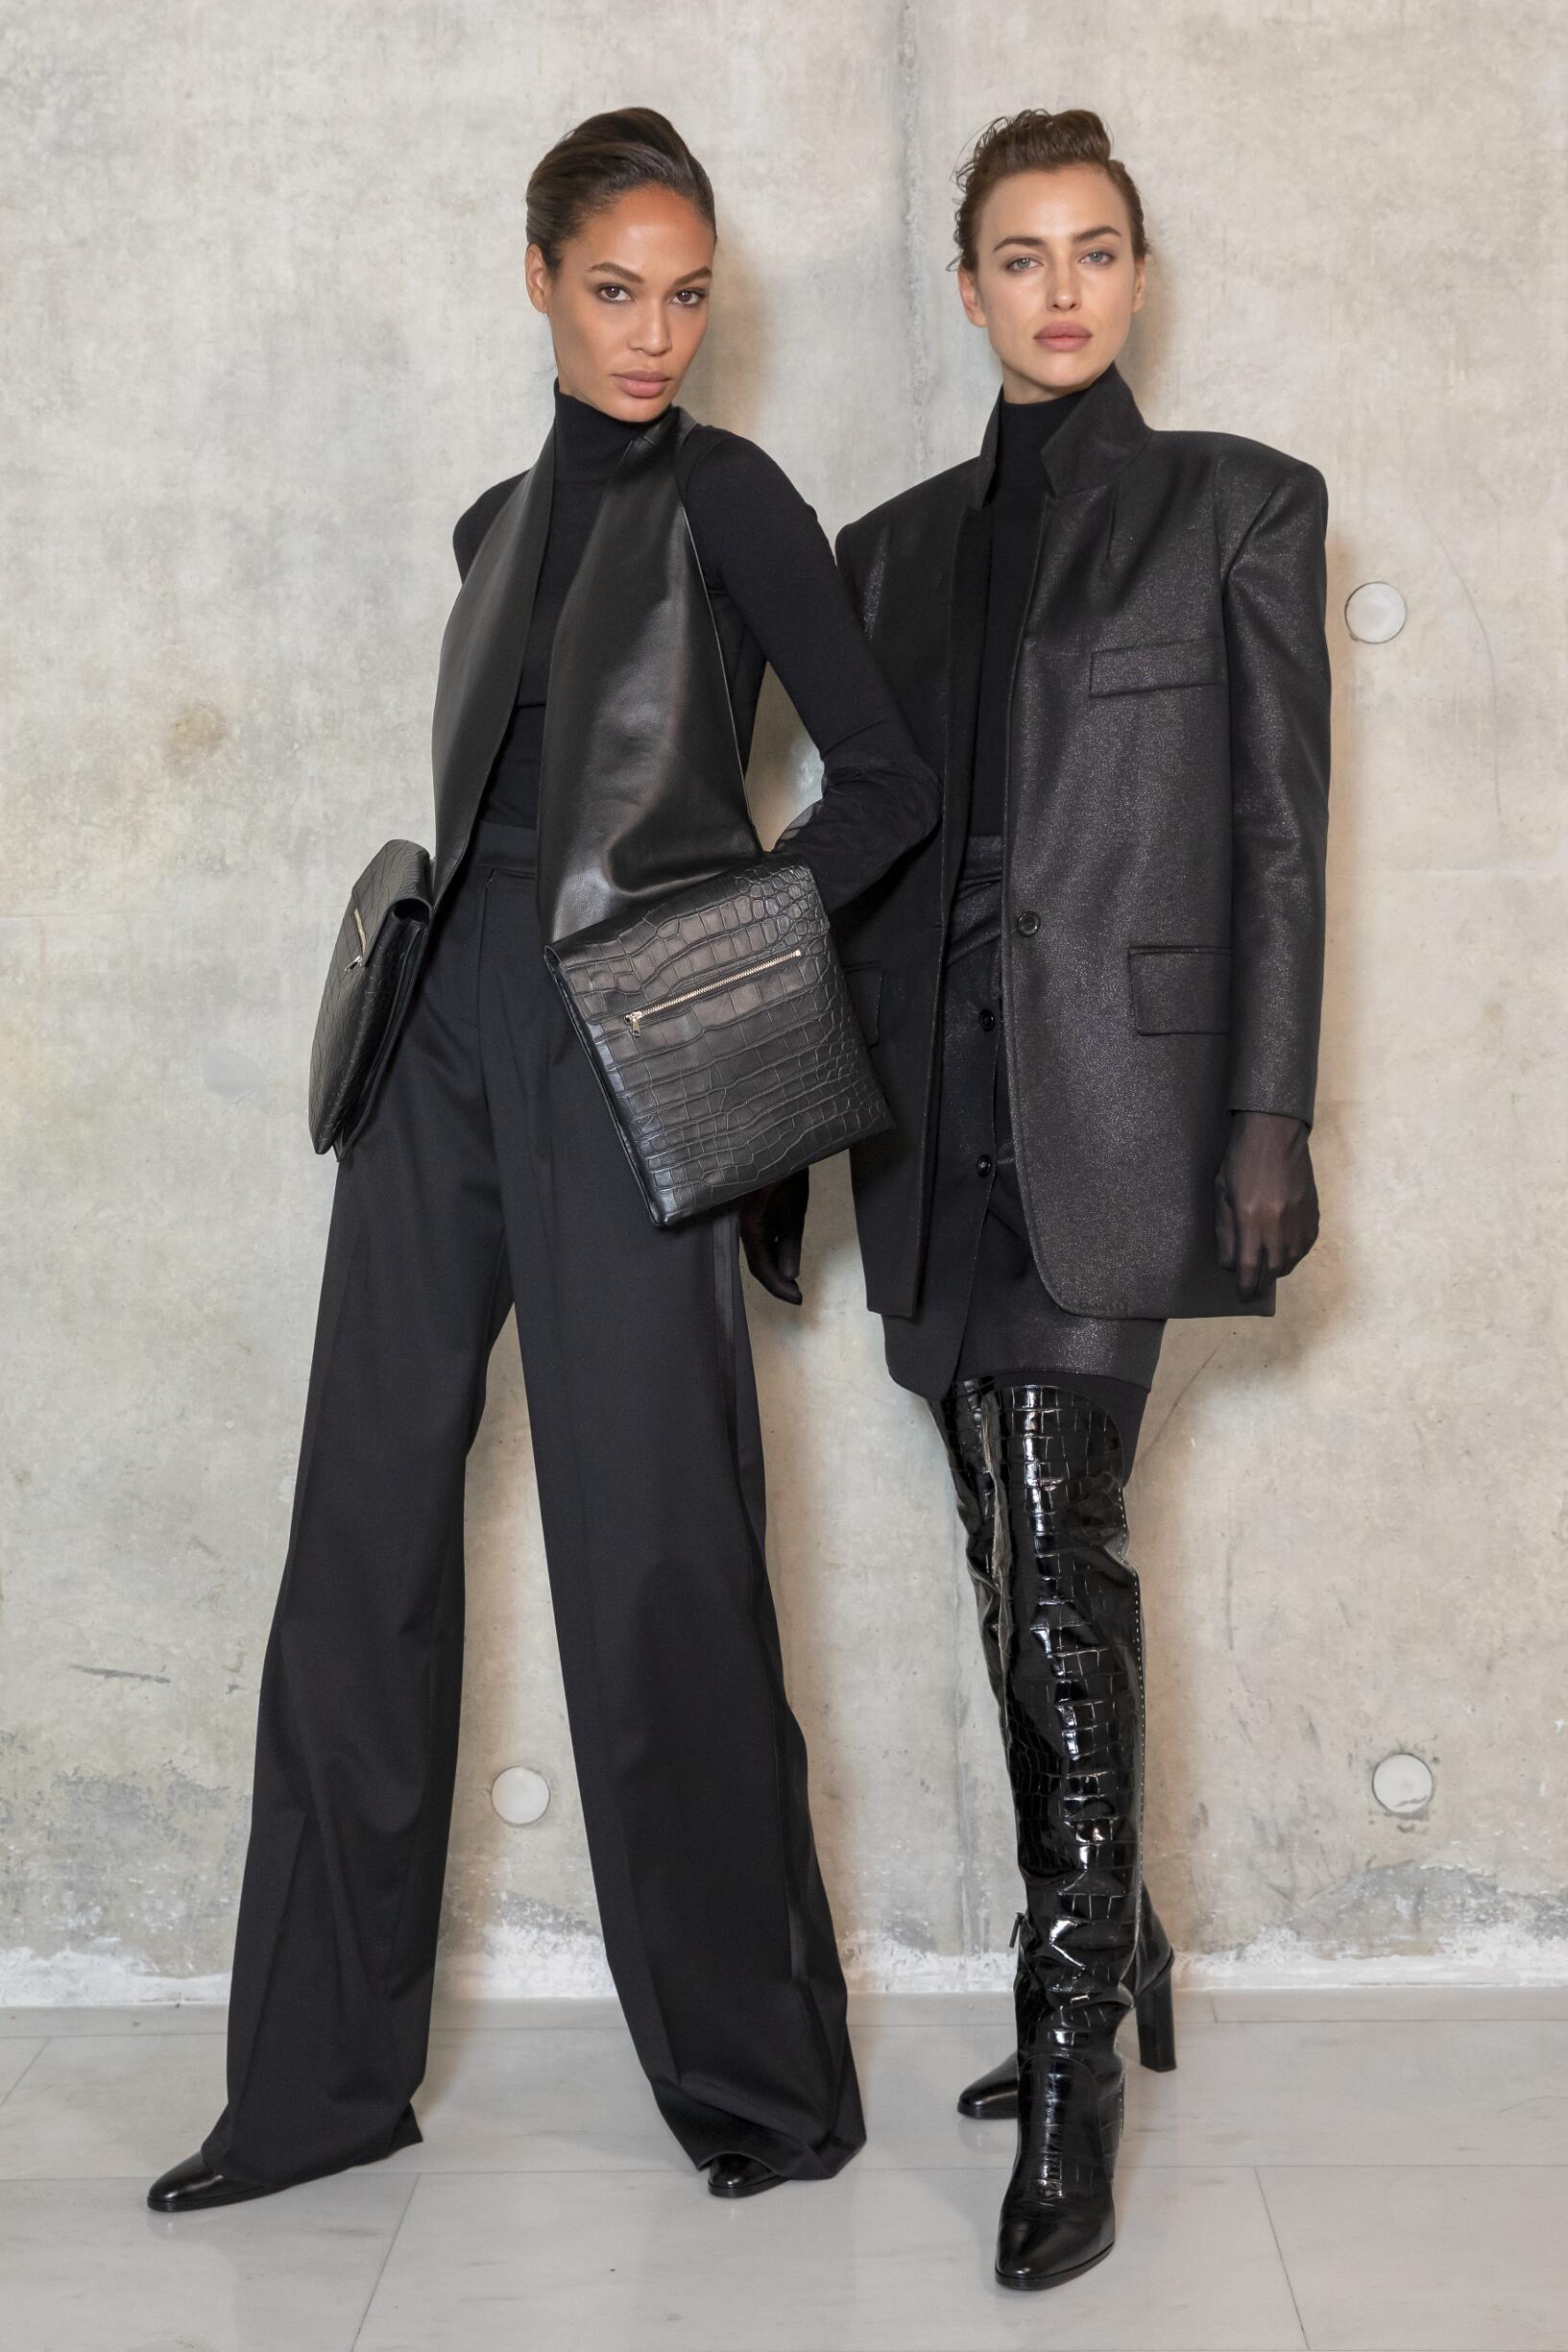 Backstage Max Mara Models Womenswear 2019-2020